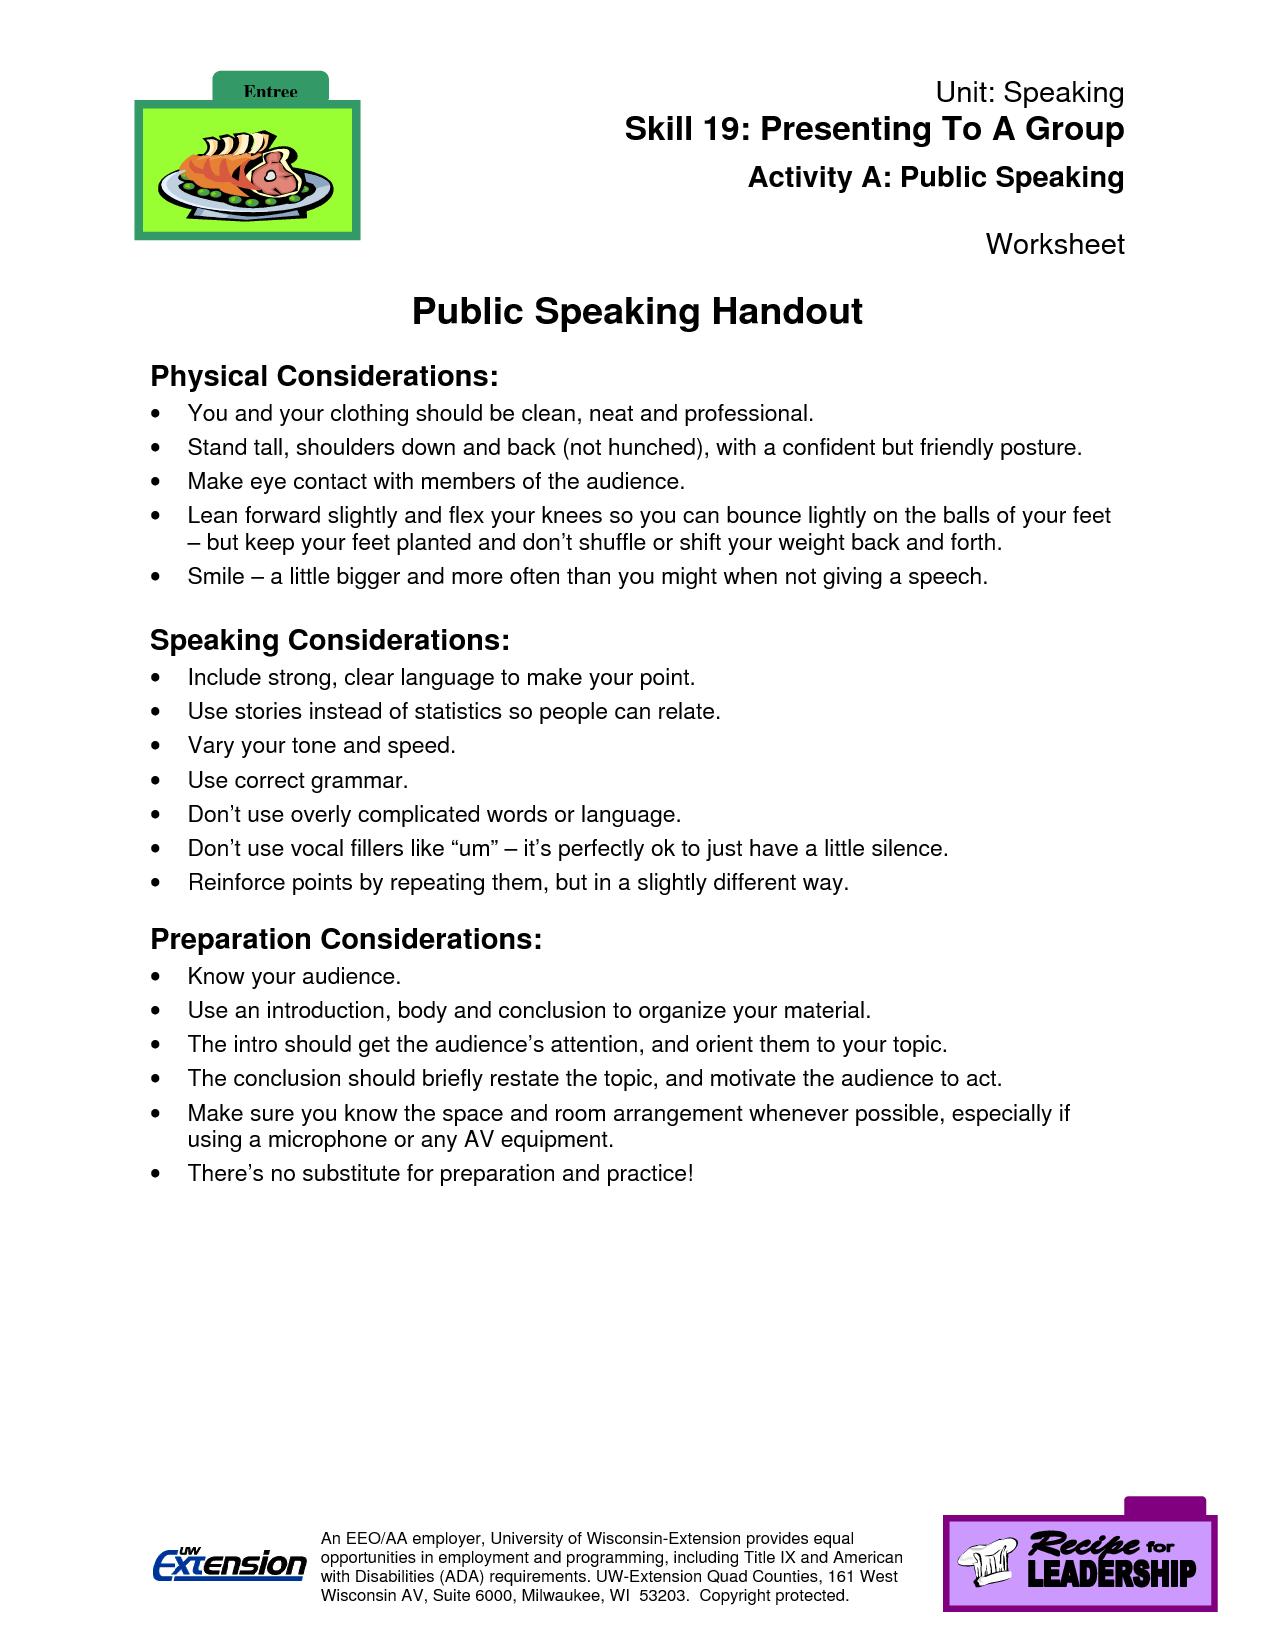 Public Speaking Worksheet Public Speaking Worksheet